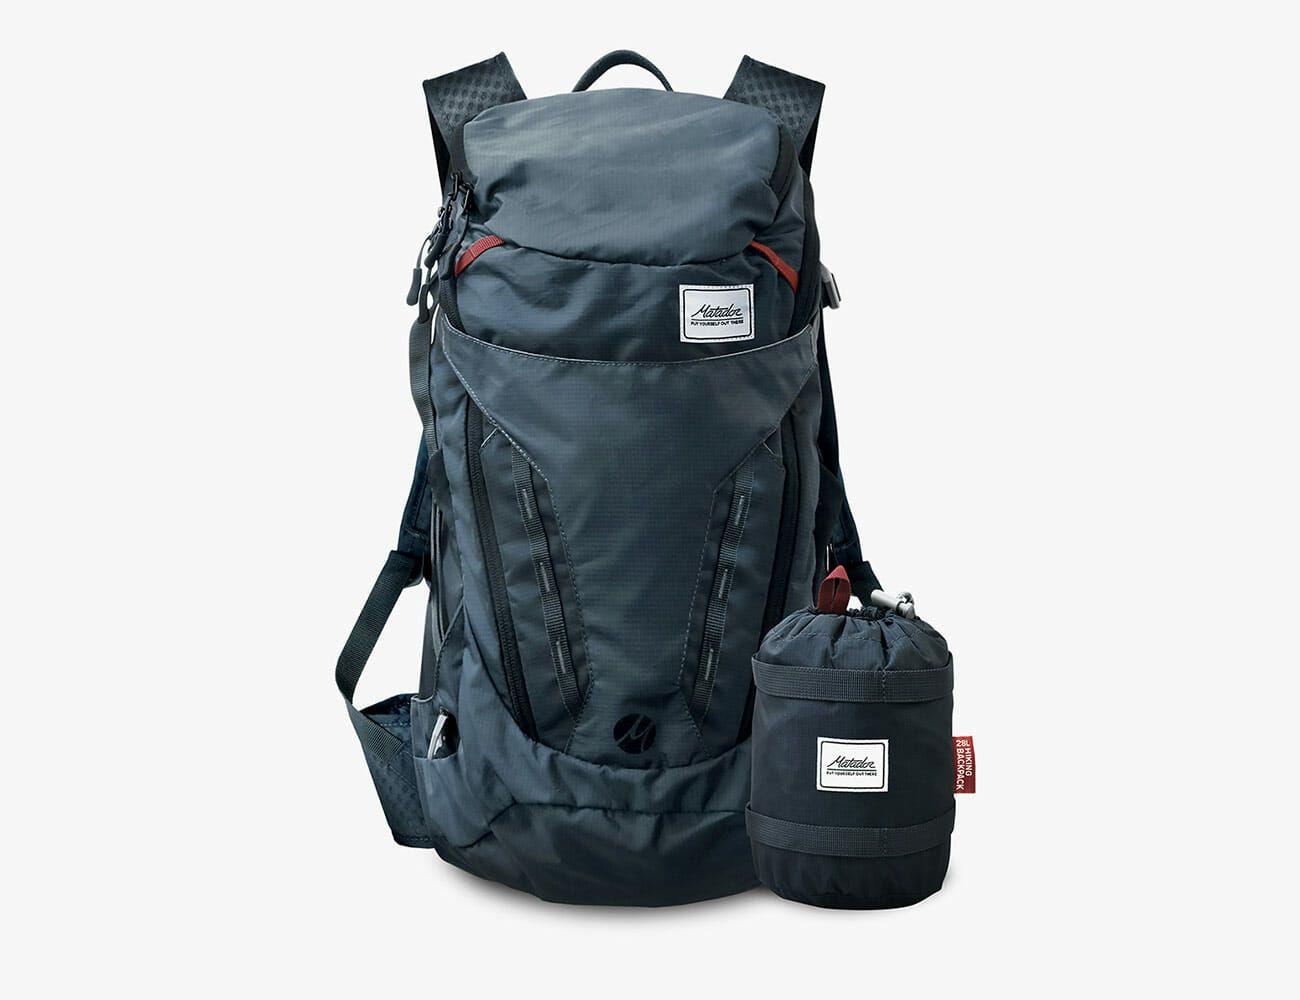 Matador_Beast28_backpack